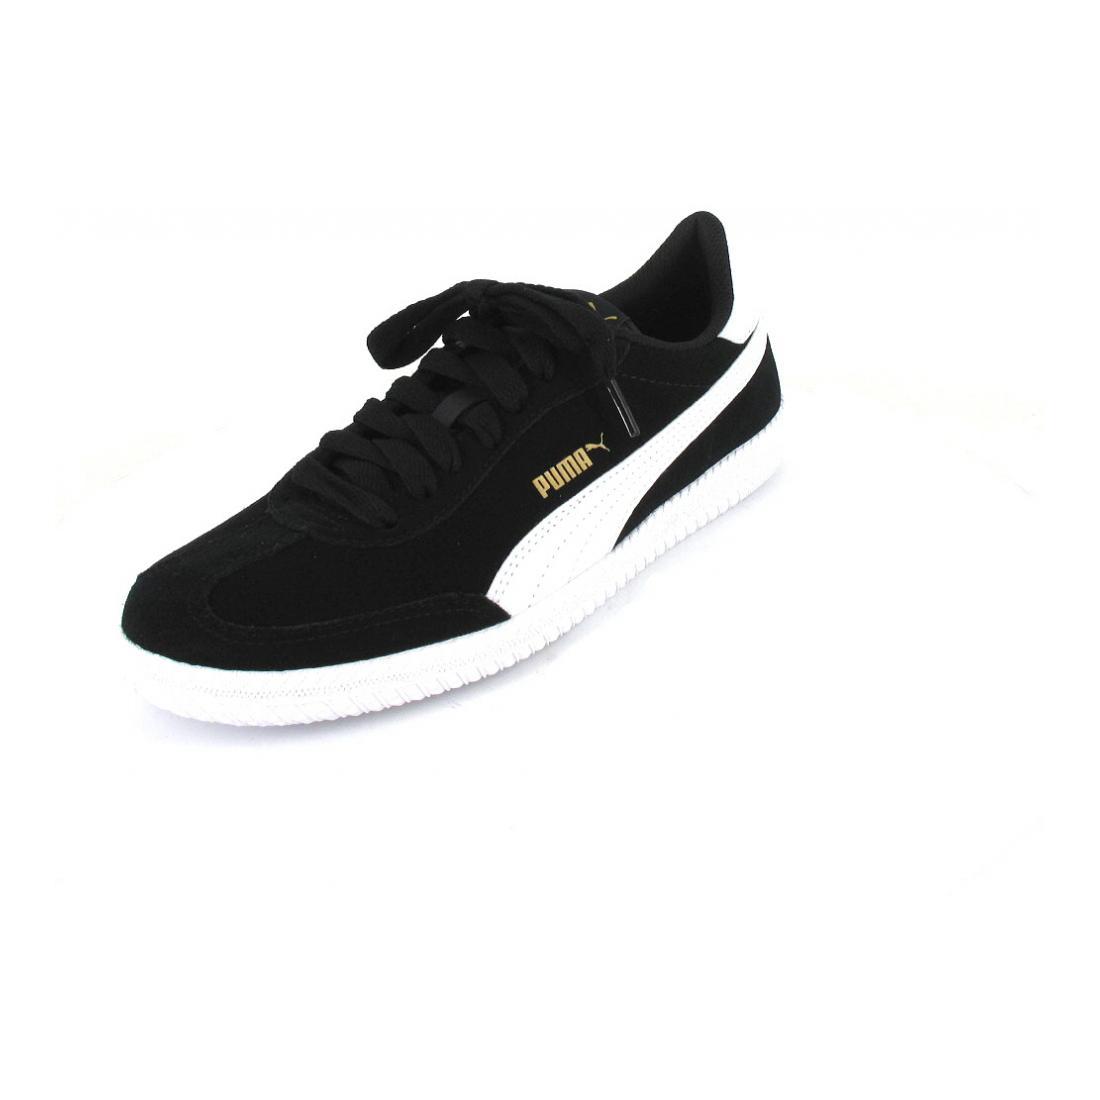 Puma Sneaker Astro Cup